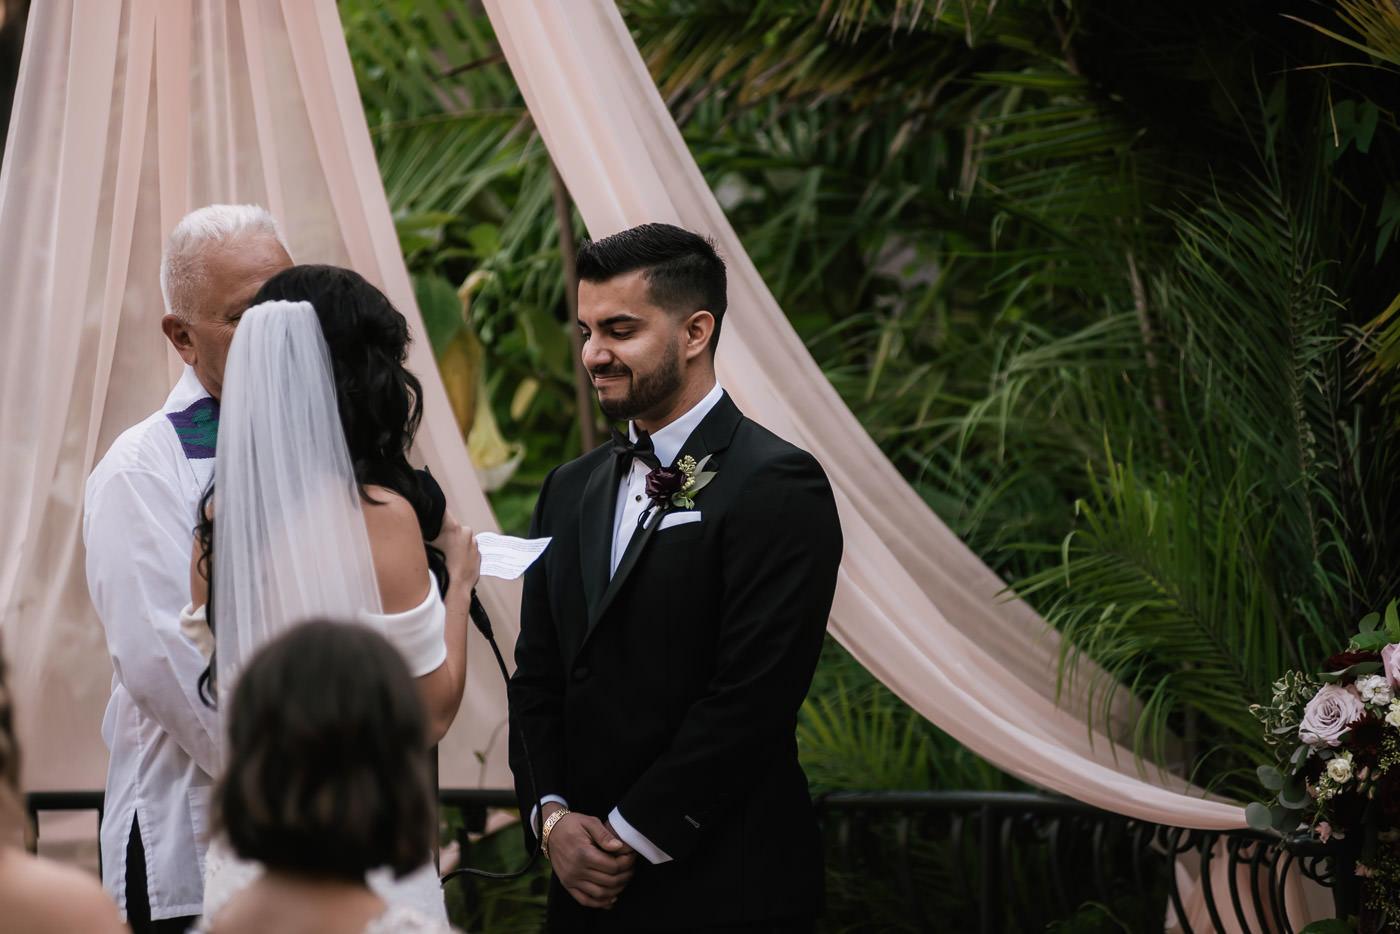 eden-gardens-wedding-photographer-romantic-51.jpg